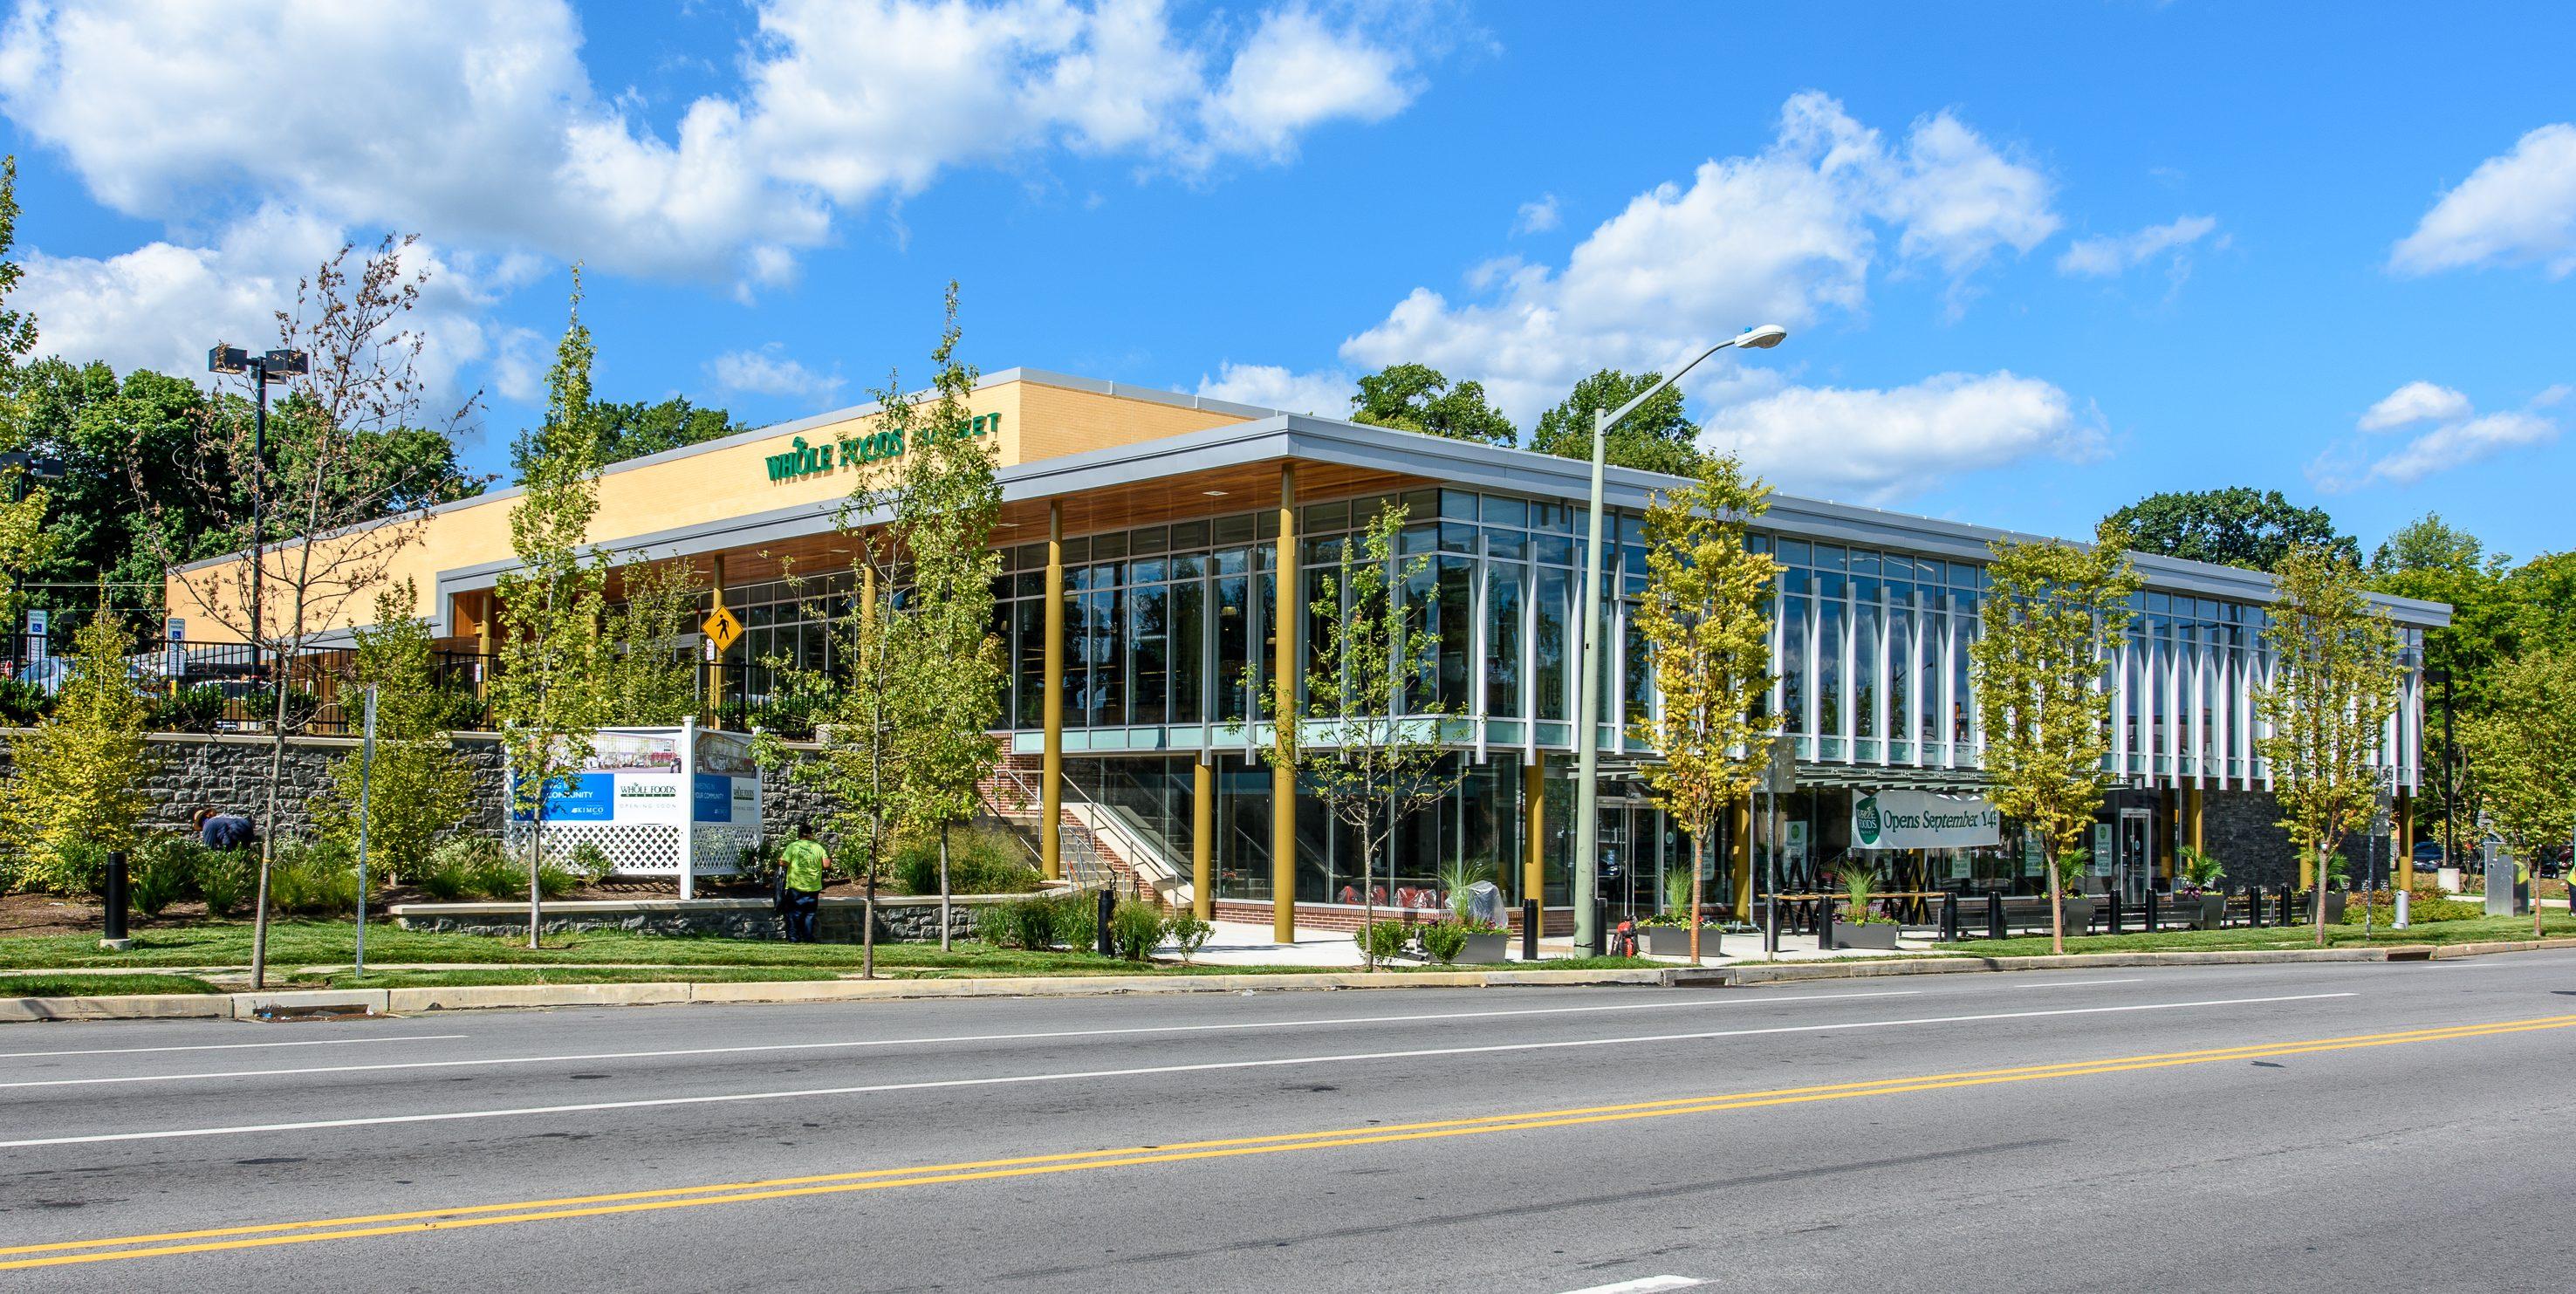 Whole Foods Rockville Md Parking